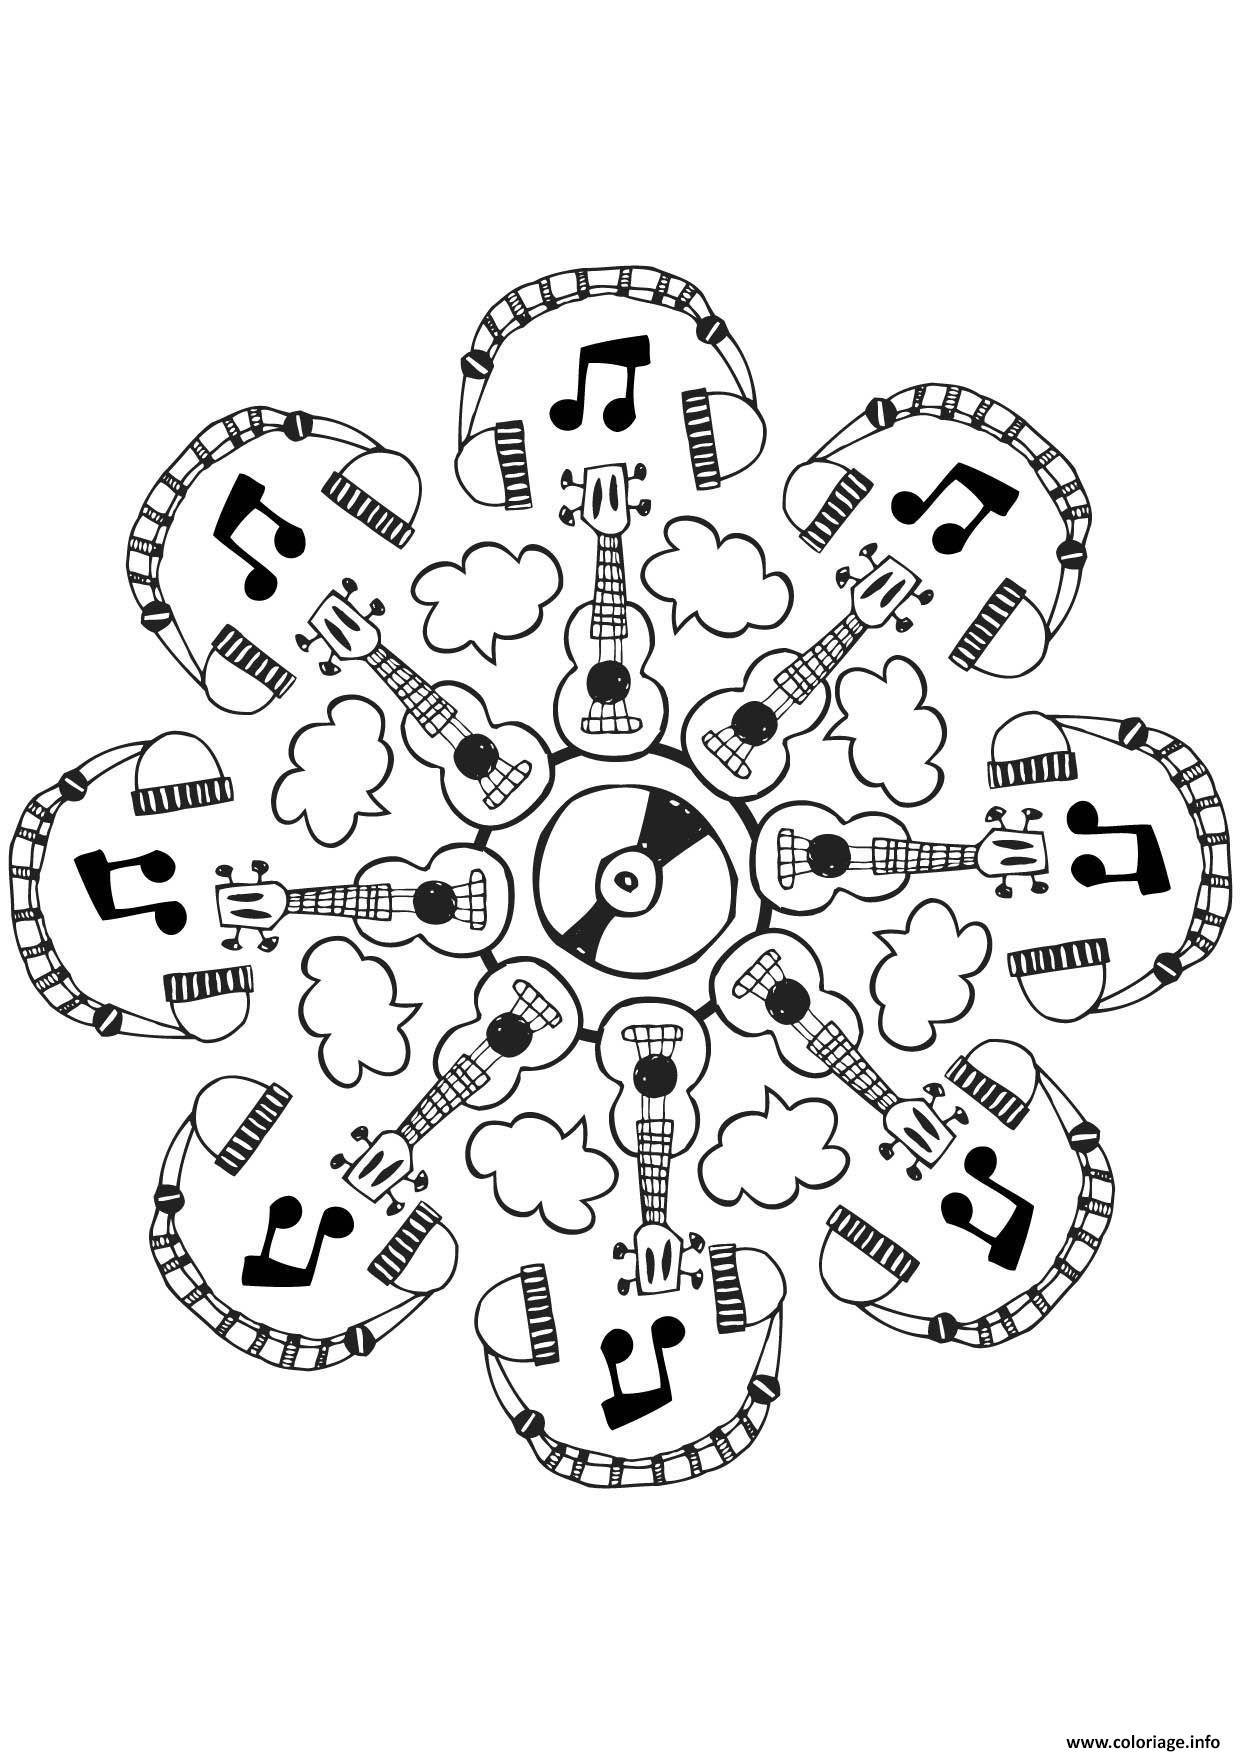 Coloriage Mandala Musique Dessin Gulli A Imprimer